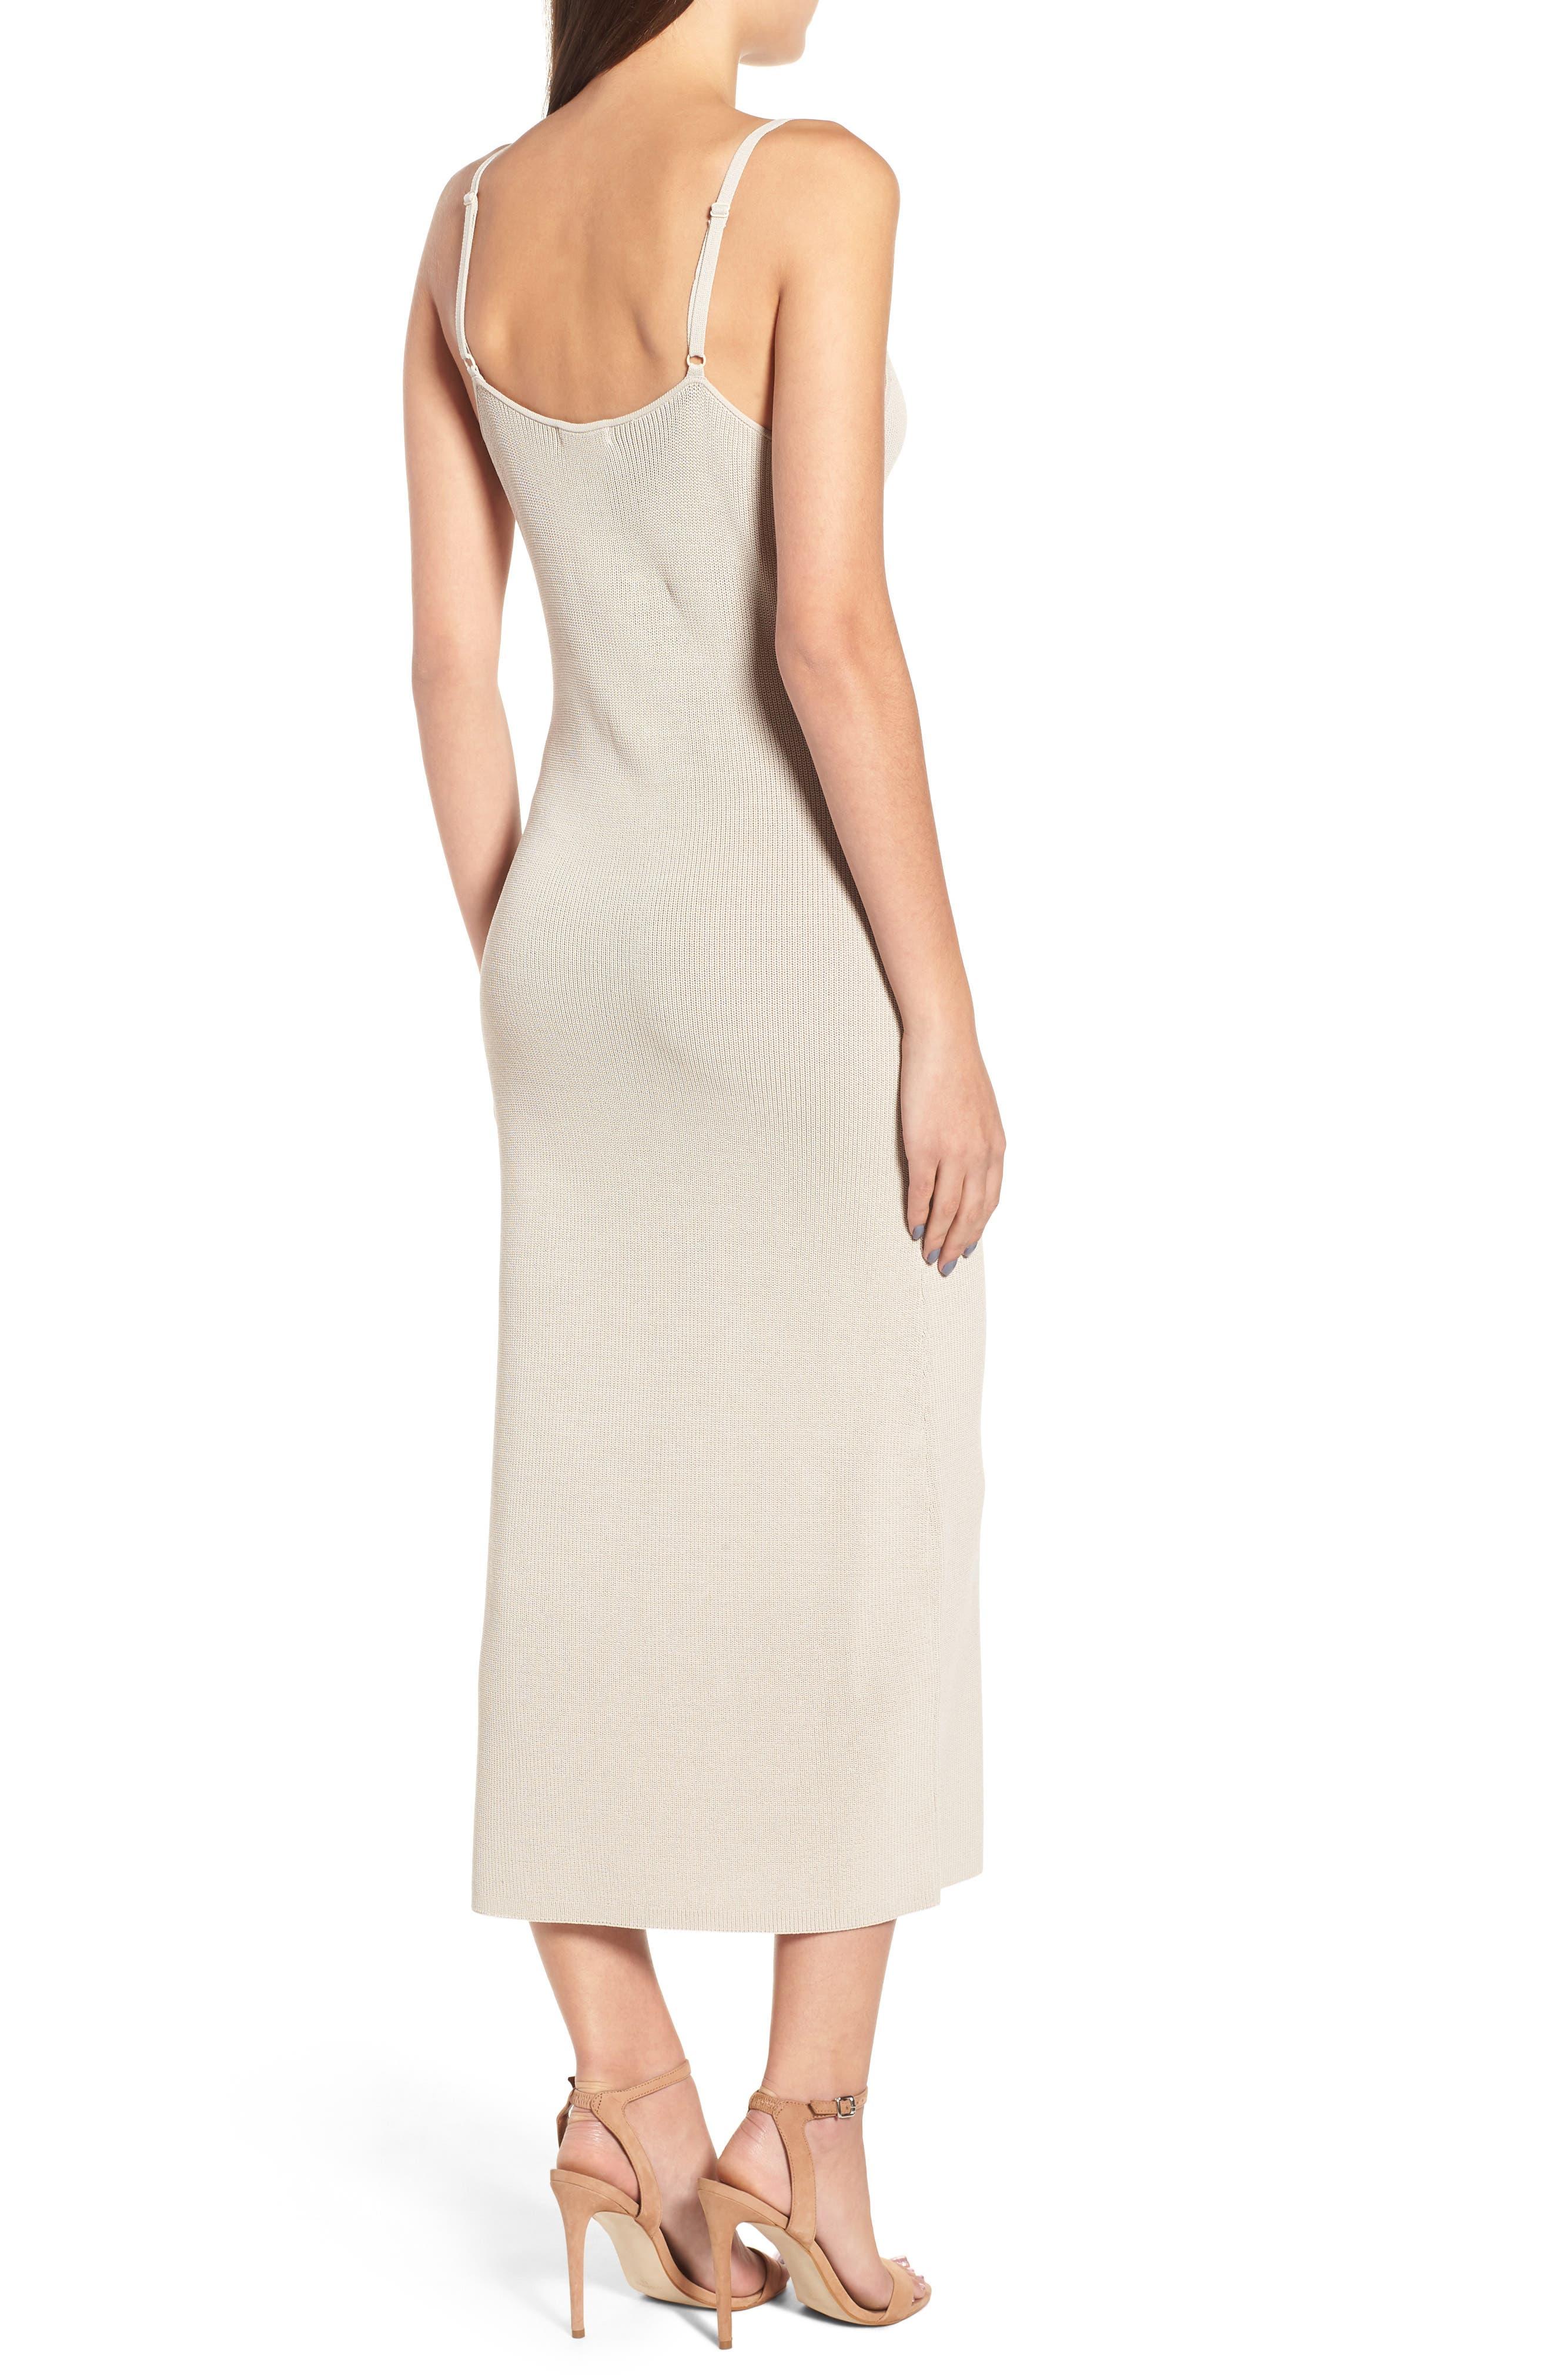 Sweater Strap Dress,                             Alternate thumbnail 2, color,                             050